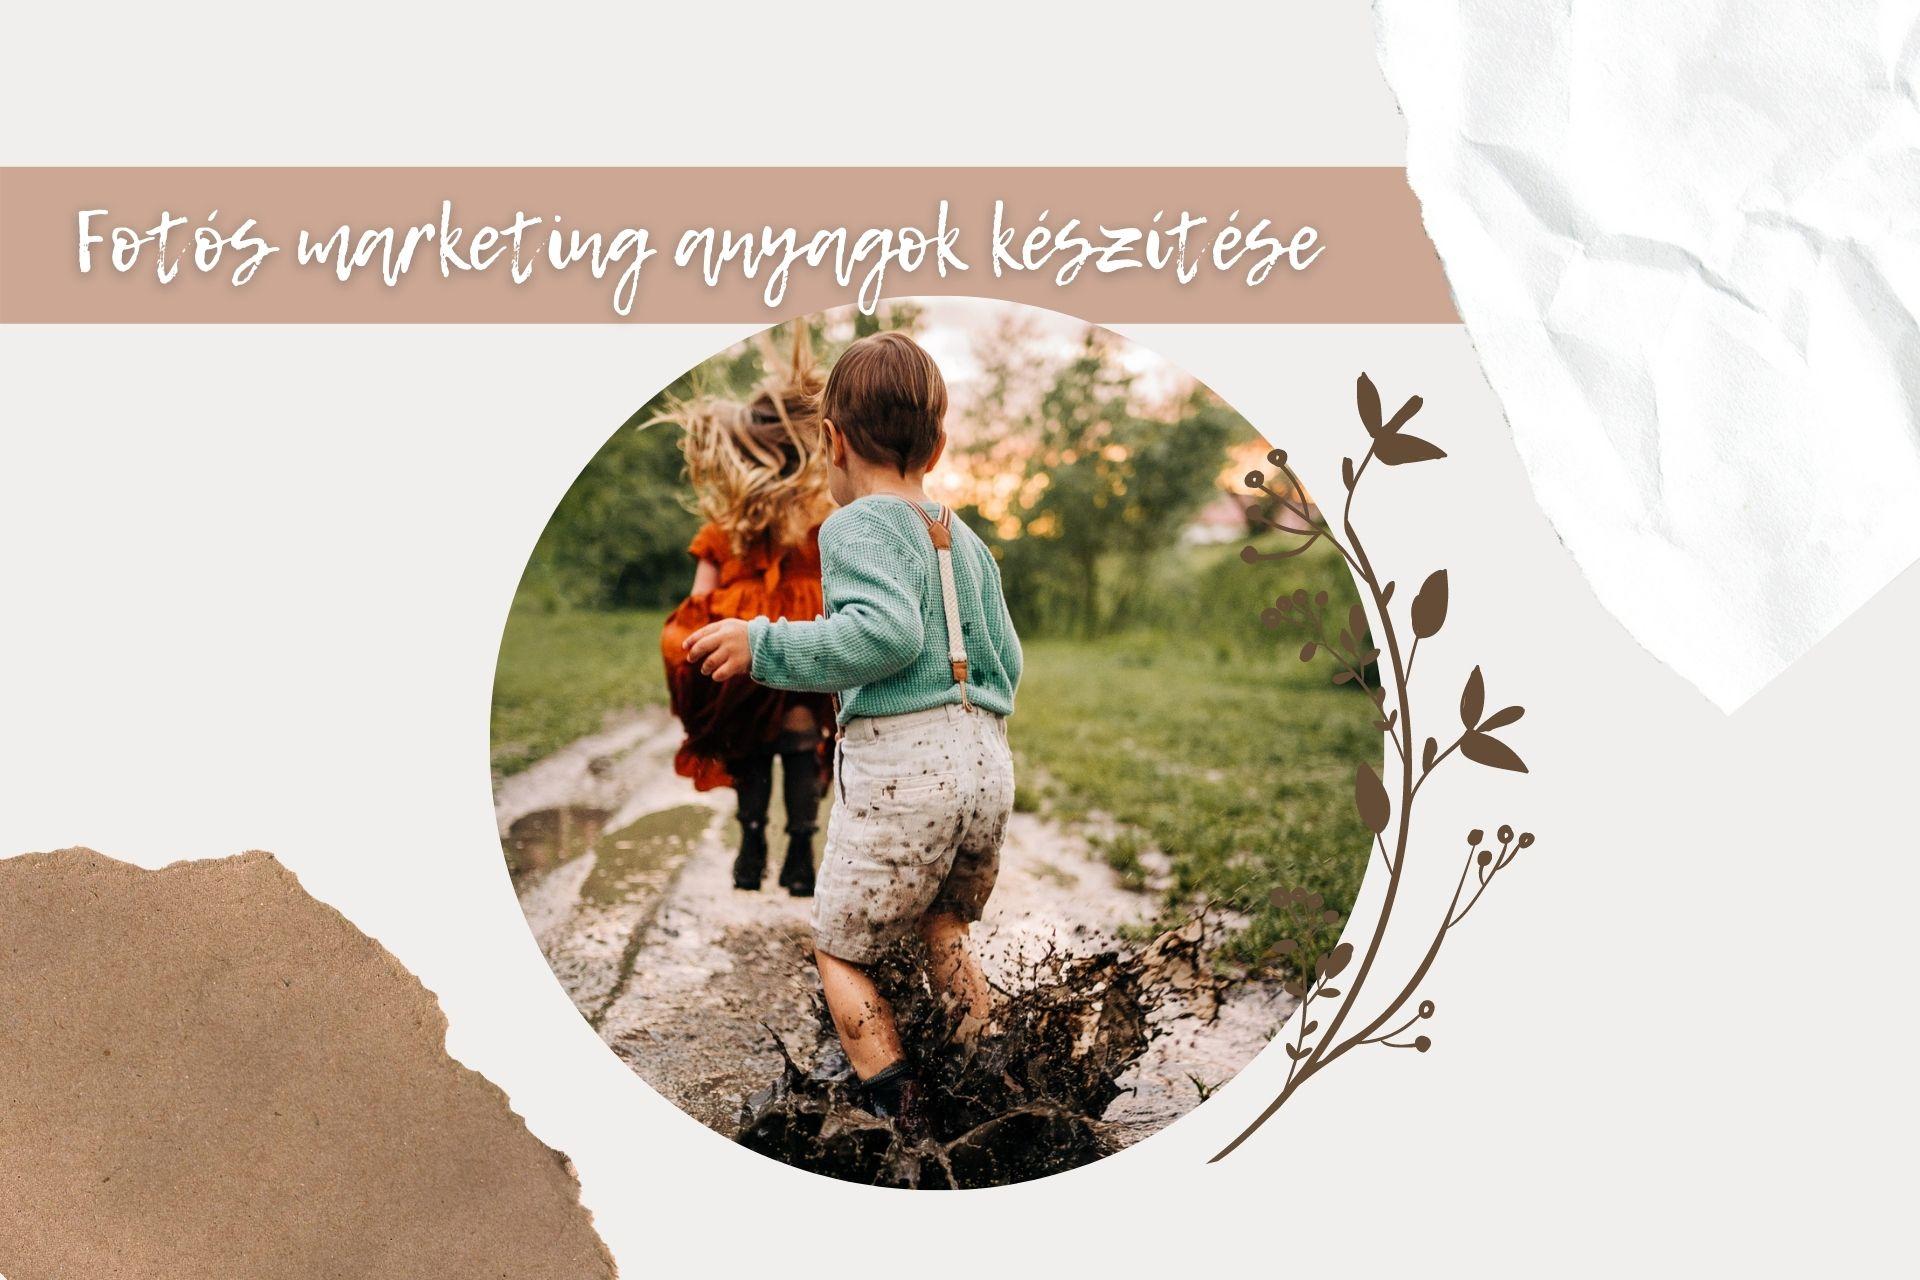 fotos-marketing-anyagok-keszitese